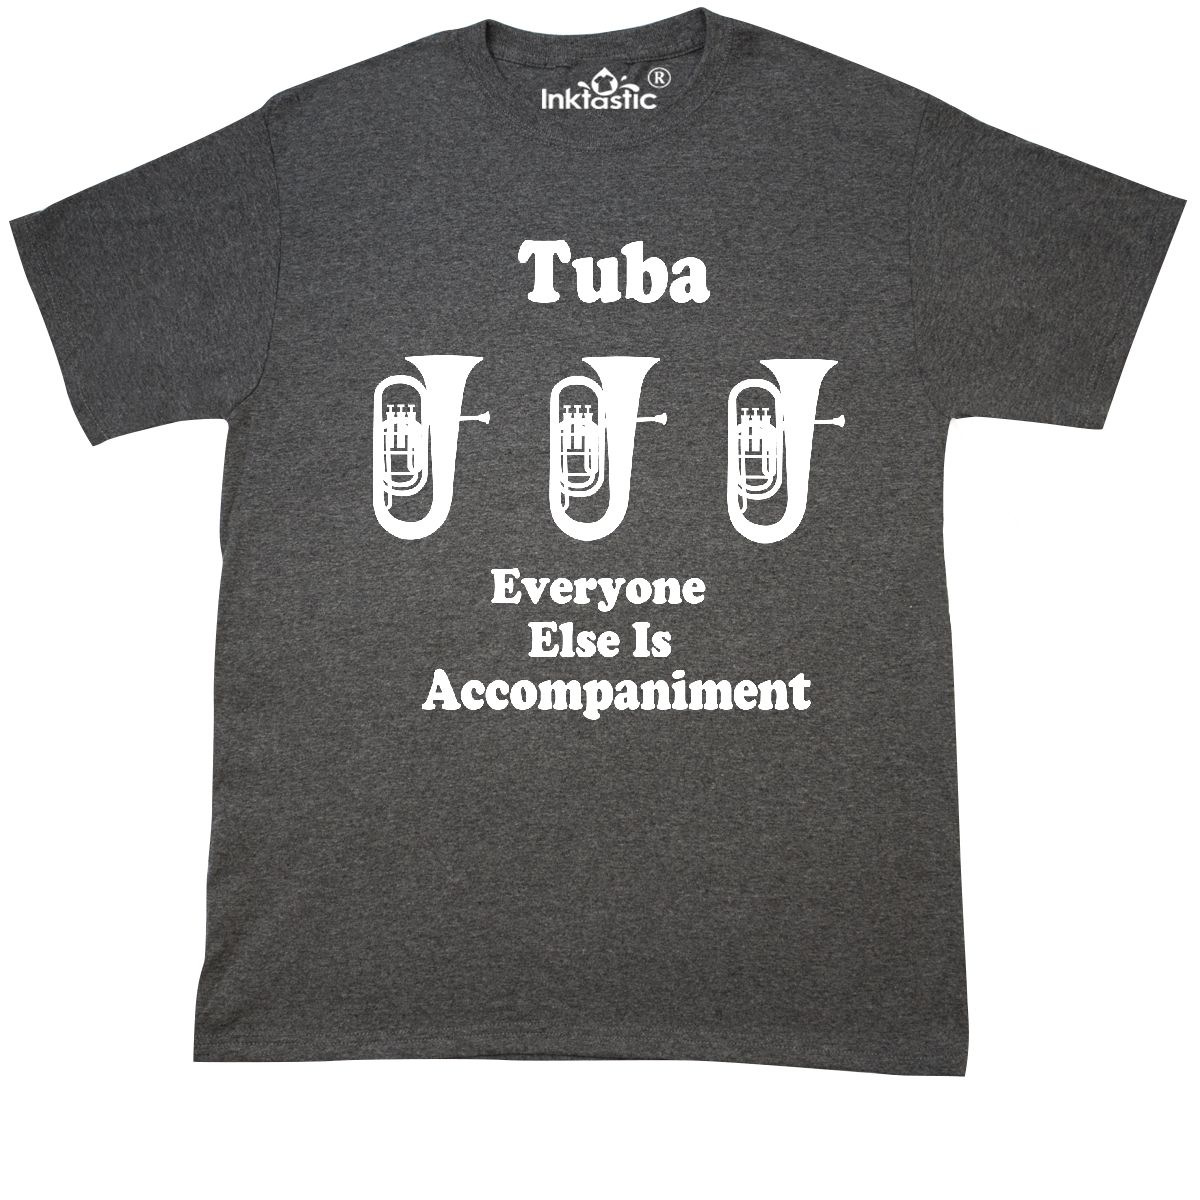 1d6cb604 Inktastic Funny Tuba Player Music Joke T-Shirt Marching Band Gift ...